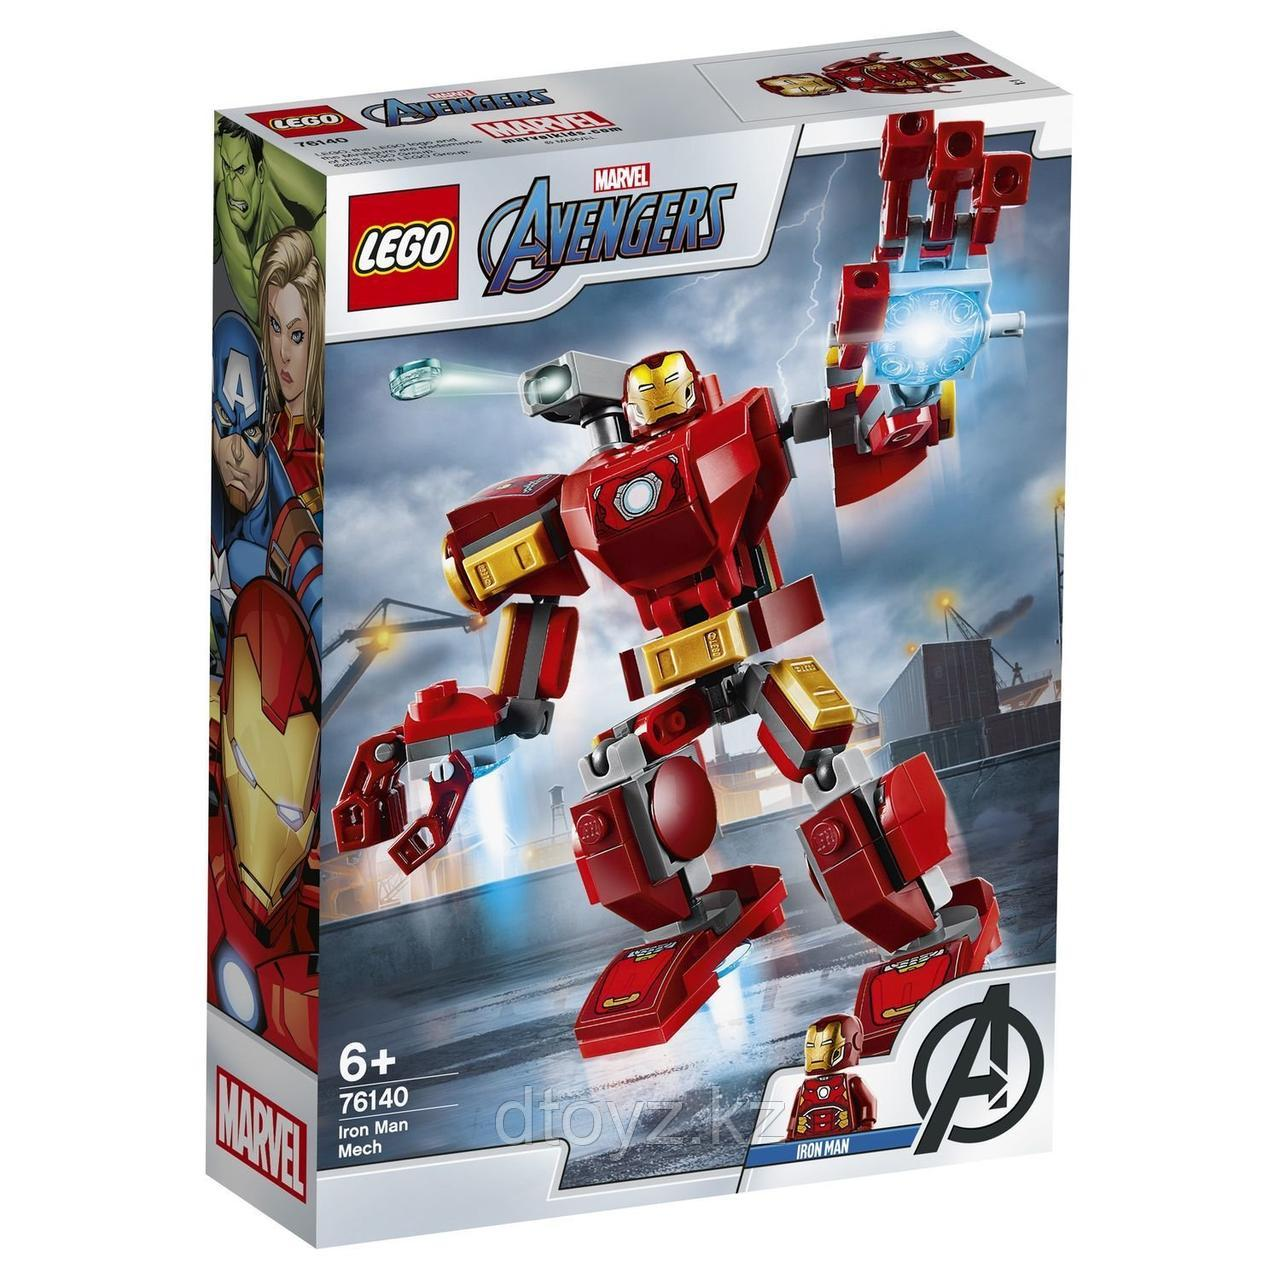 Lego 76140 Marvel Super Heroes Железный человек: трансформер